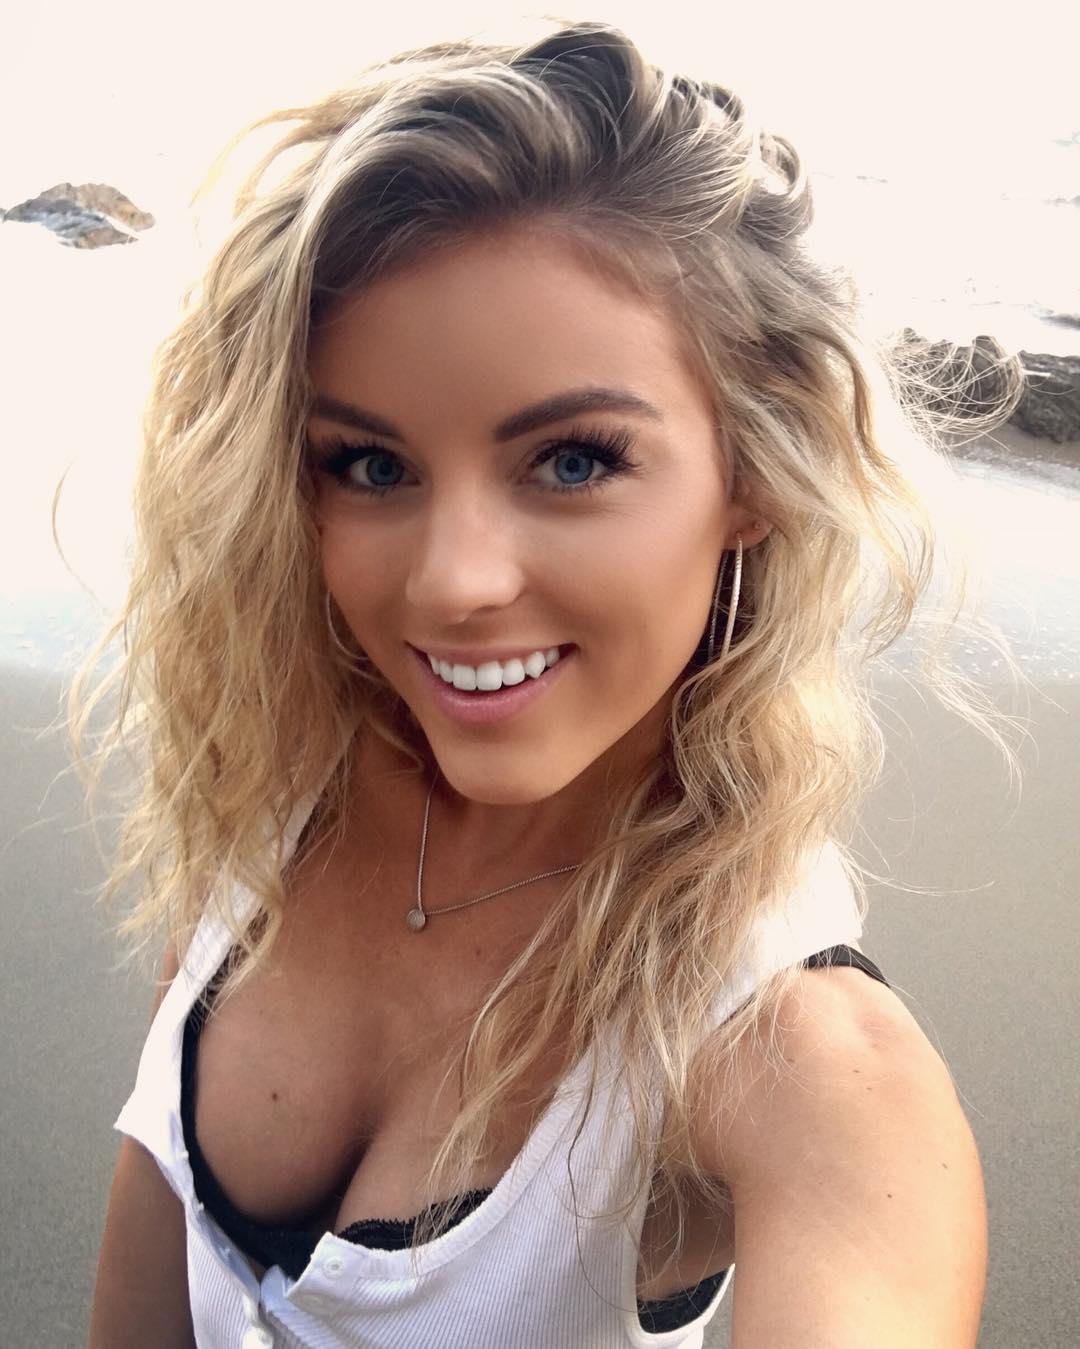 Angelique Cooper Caught Nude (3 pics 1 gif)